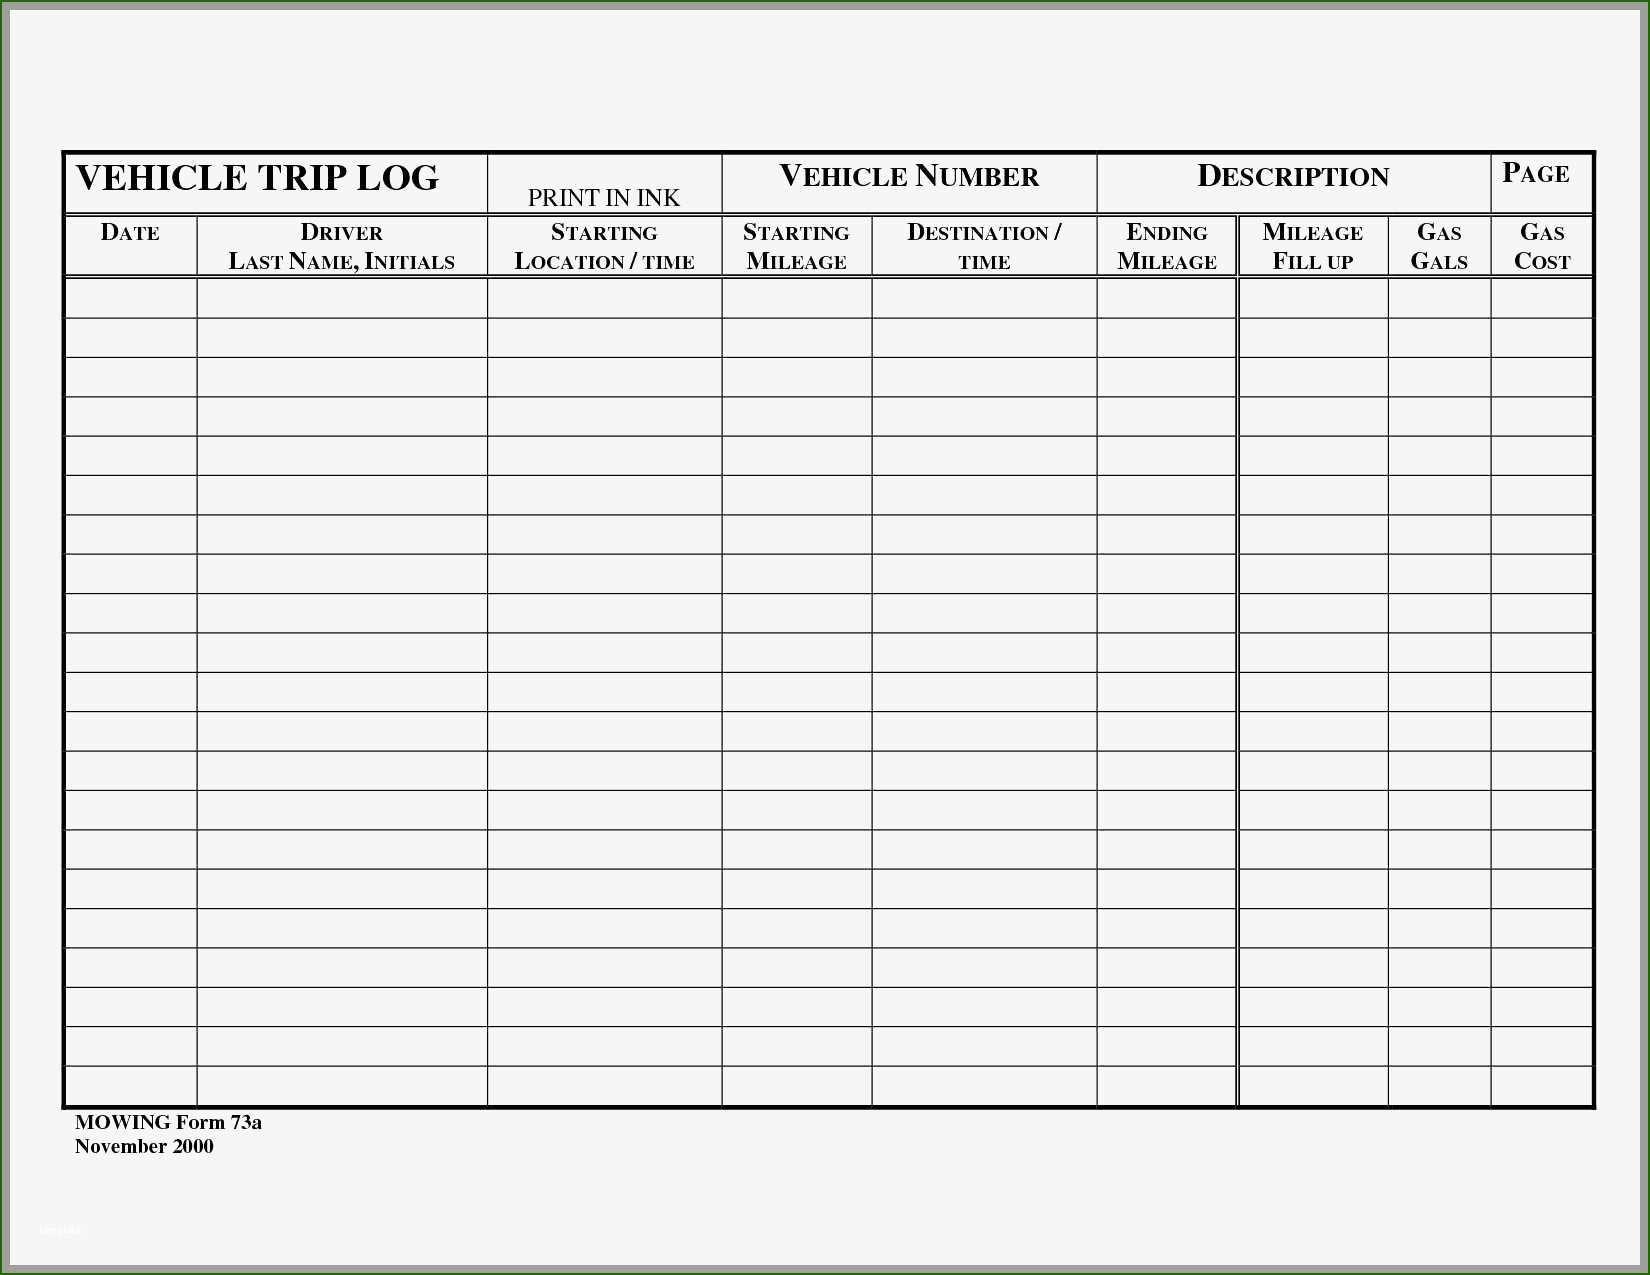 37+ credit card authorization form template download!! 12 Skillful Fleet Vehicle Maintenance Log Template Vehicle Maintenance Log Book Template Car Maintenance